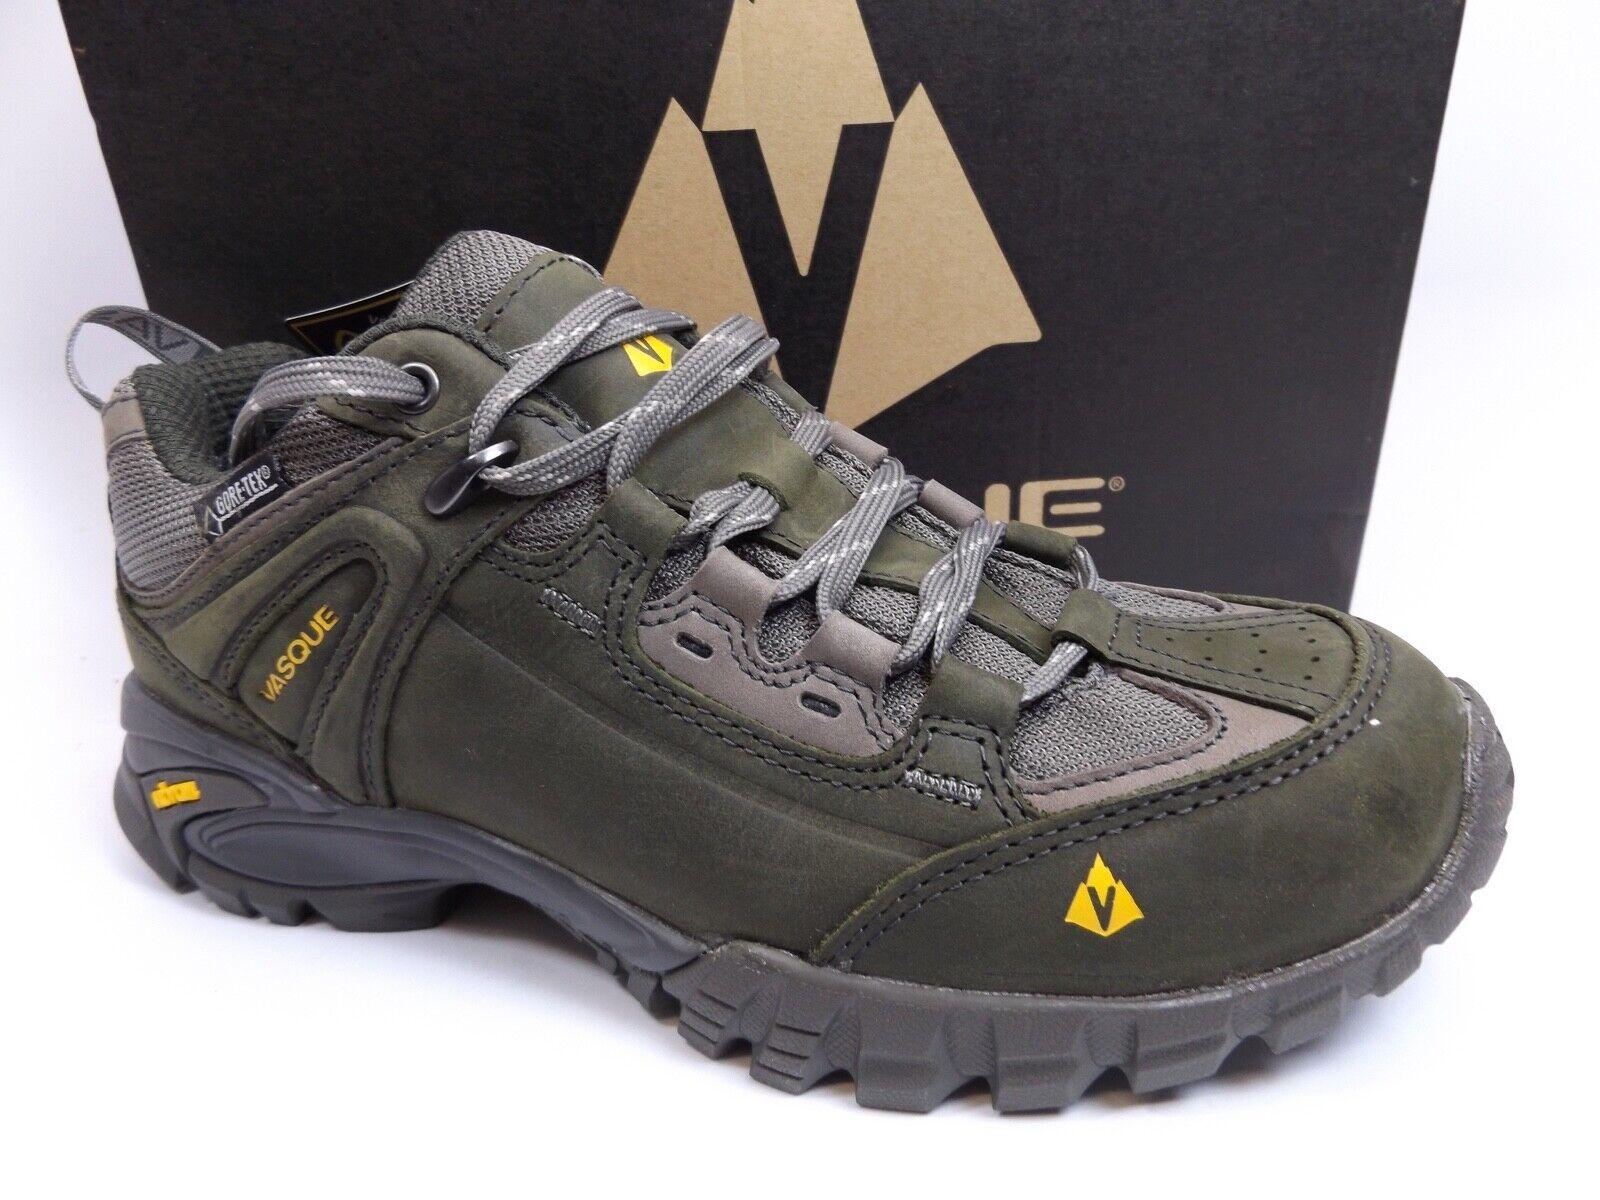 Vasque mantra 2,0 GTX botas impermeables de gortex masculino SZ 7,5 m nuevo, d1042